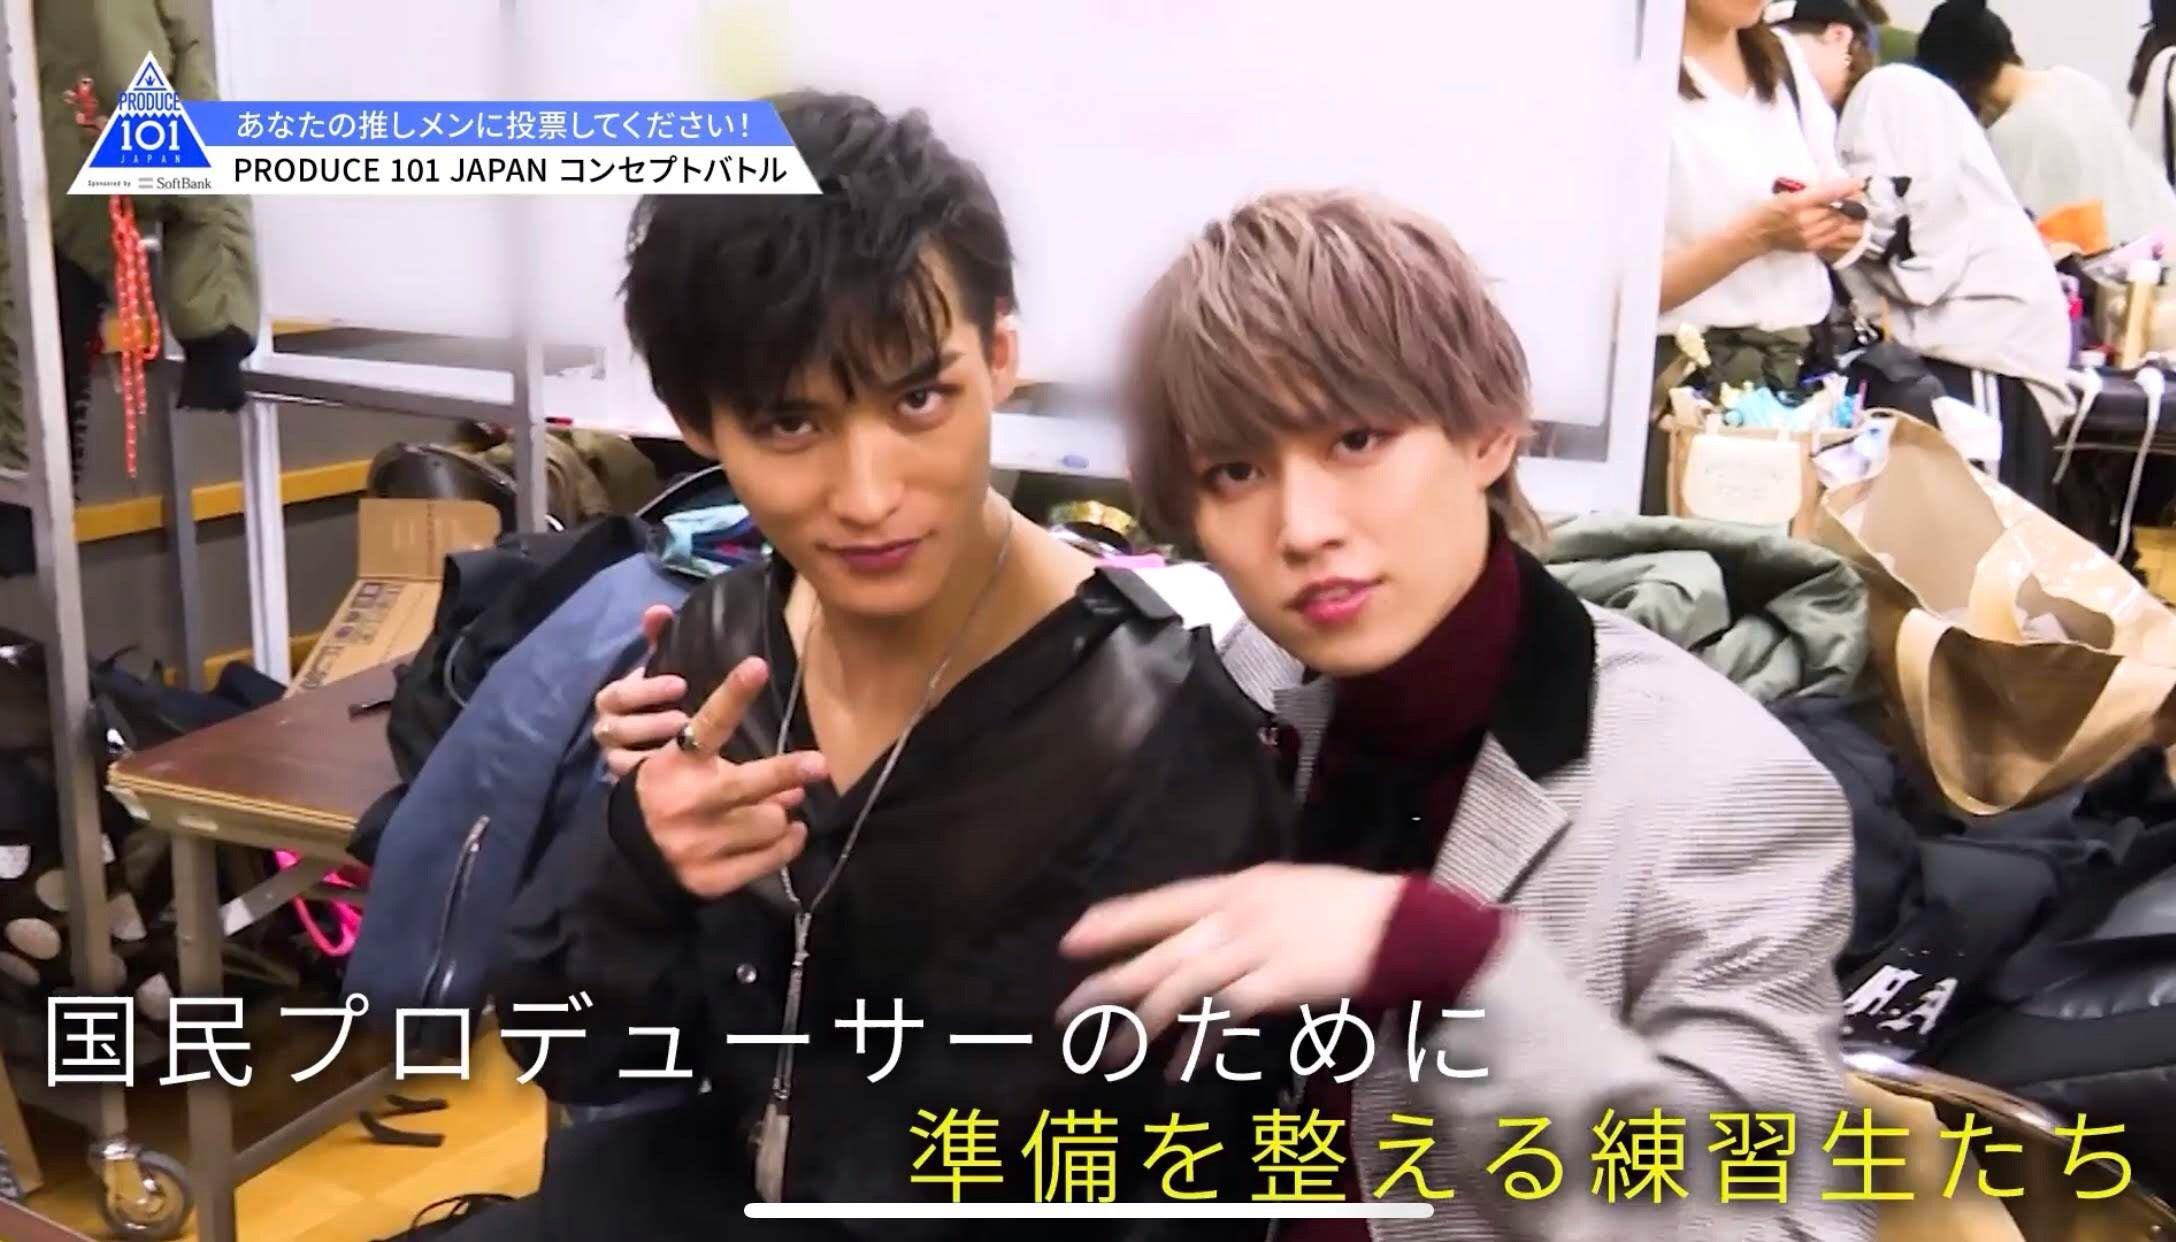 Produce 101 Japan 第9回目 コンセプトバトル 順位変動